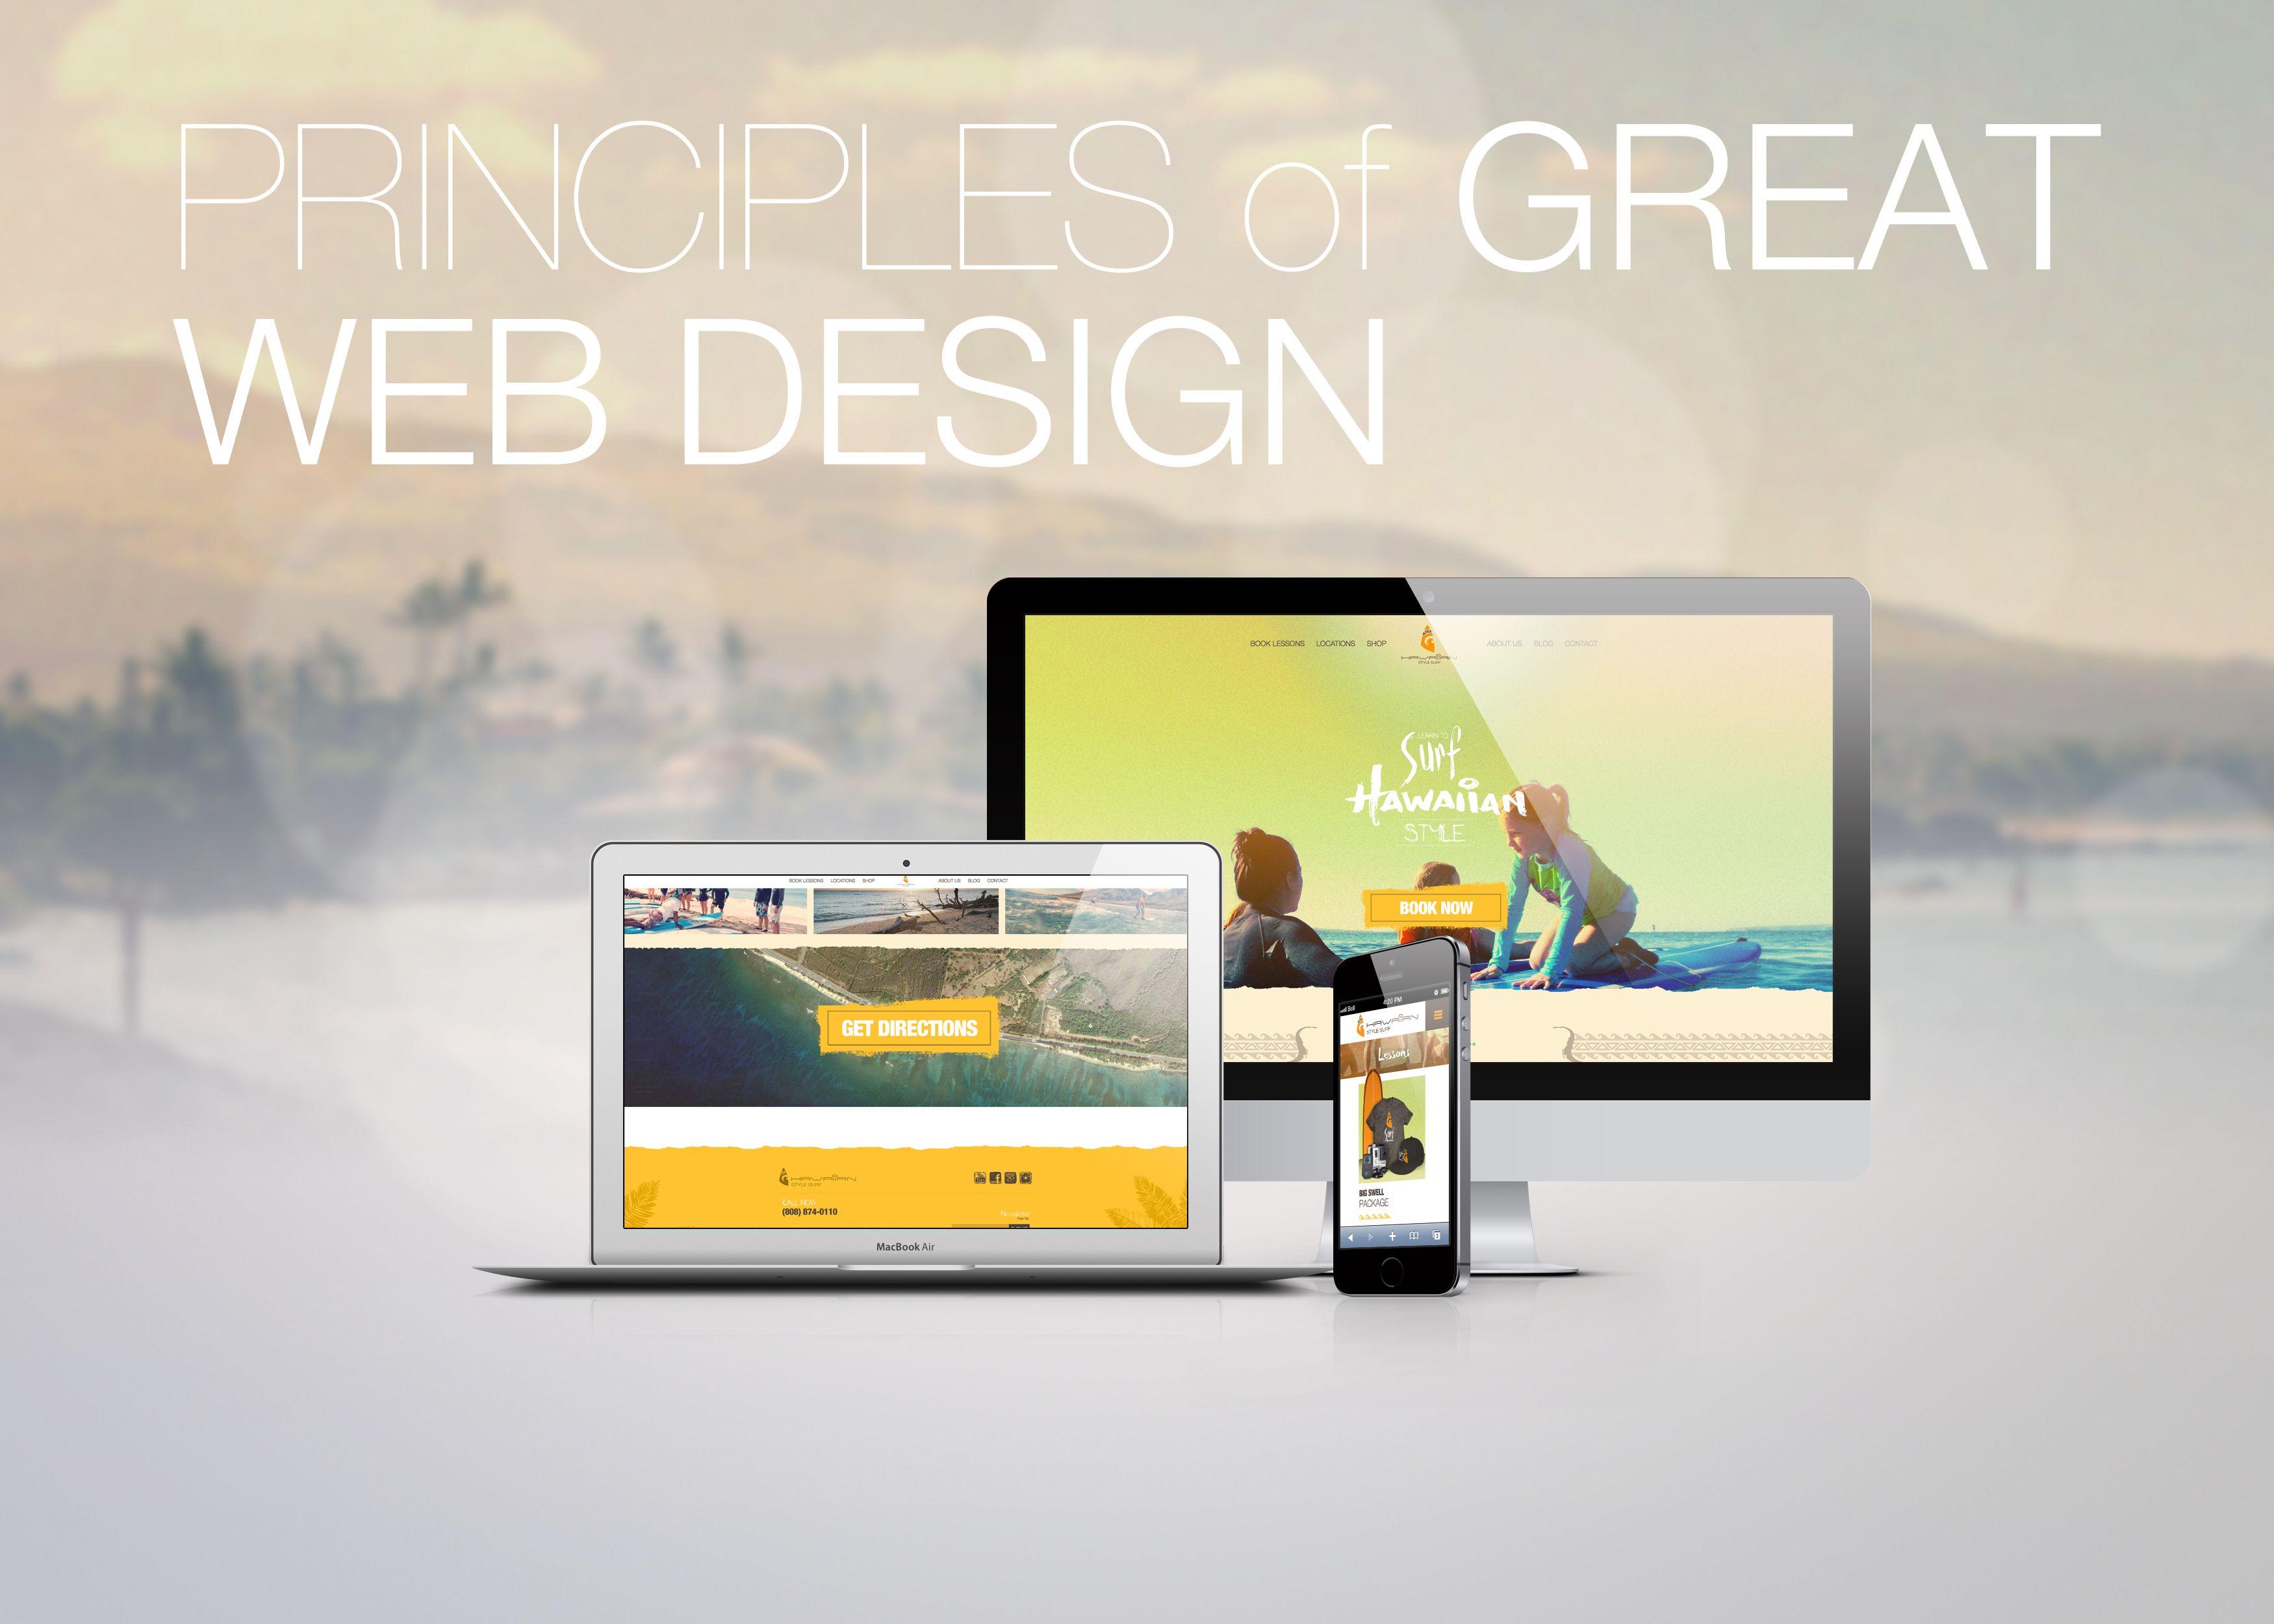 Great Tulsa Maui Web Design 5 Basic Principles Web Design Design Greats